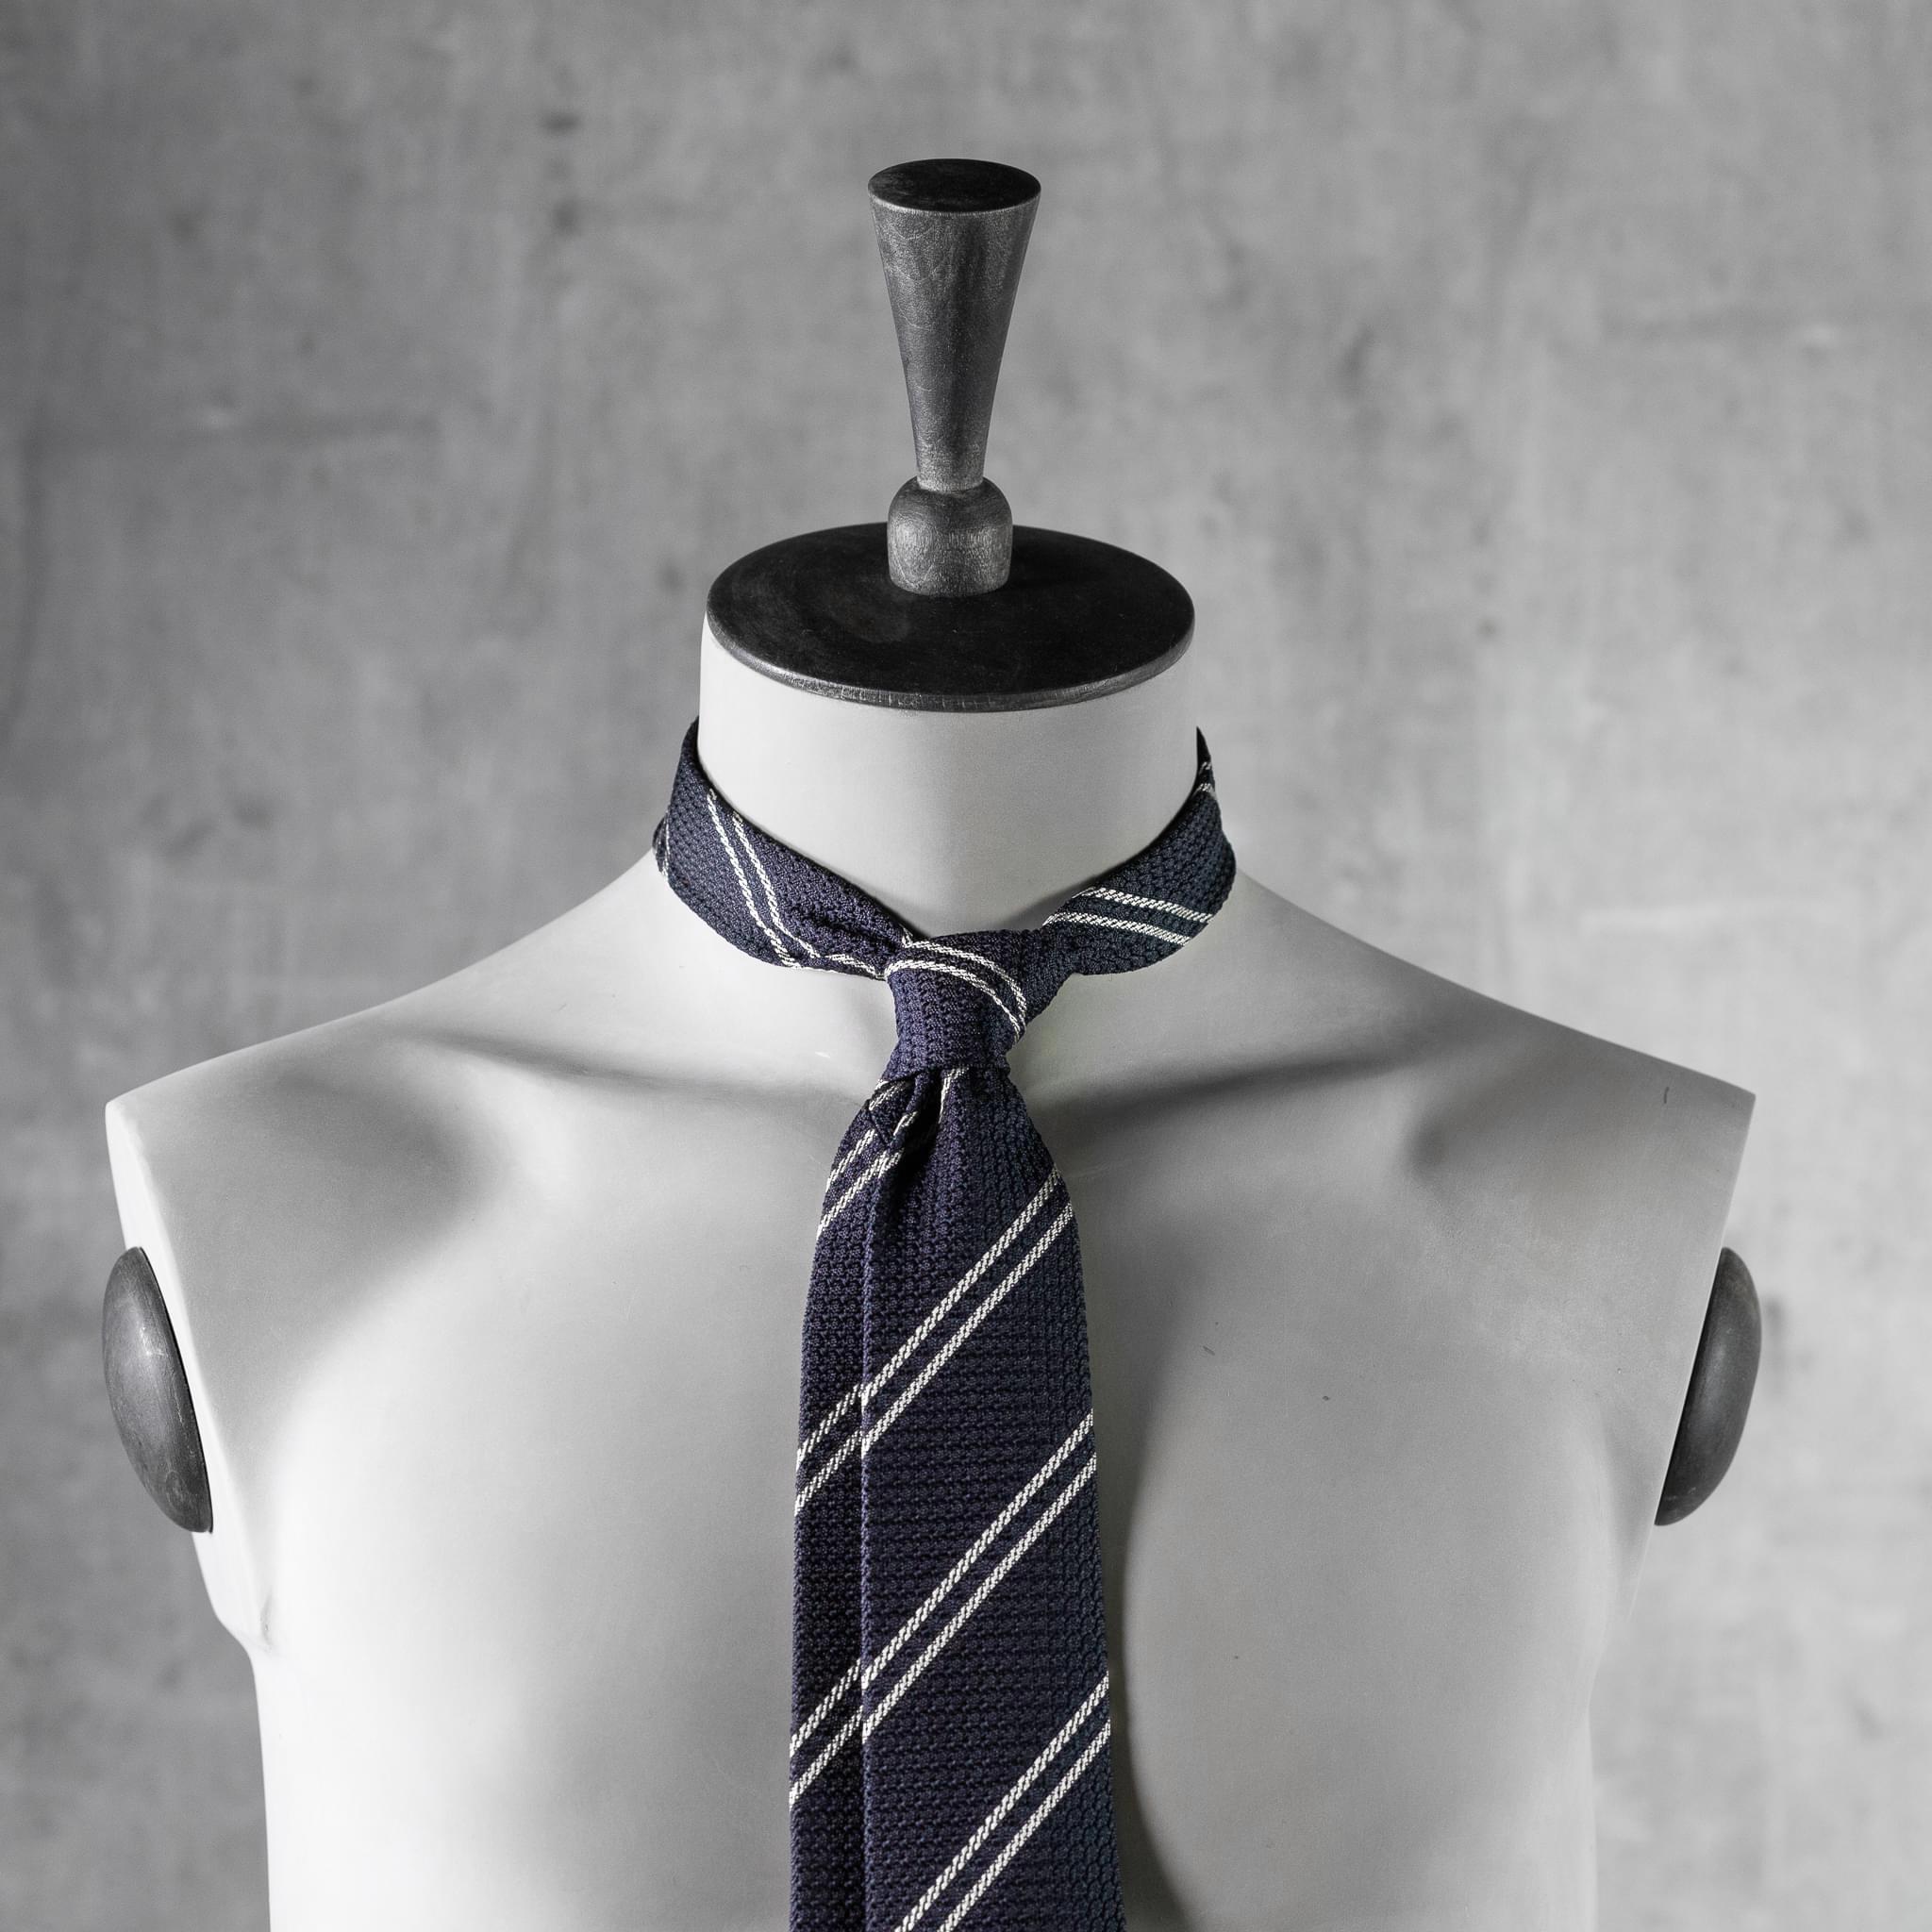 GRENADINE-0442-Tie-Initials-Corbata-Iniciales-The-Seelk-4